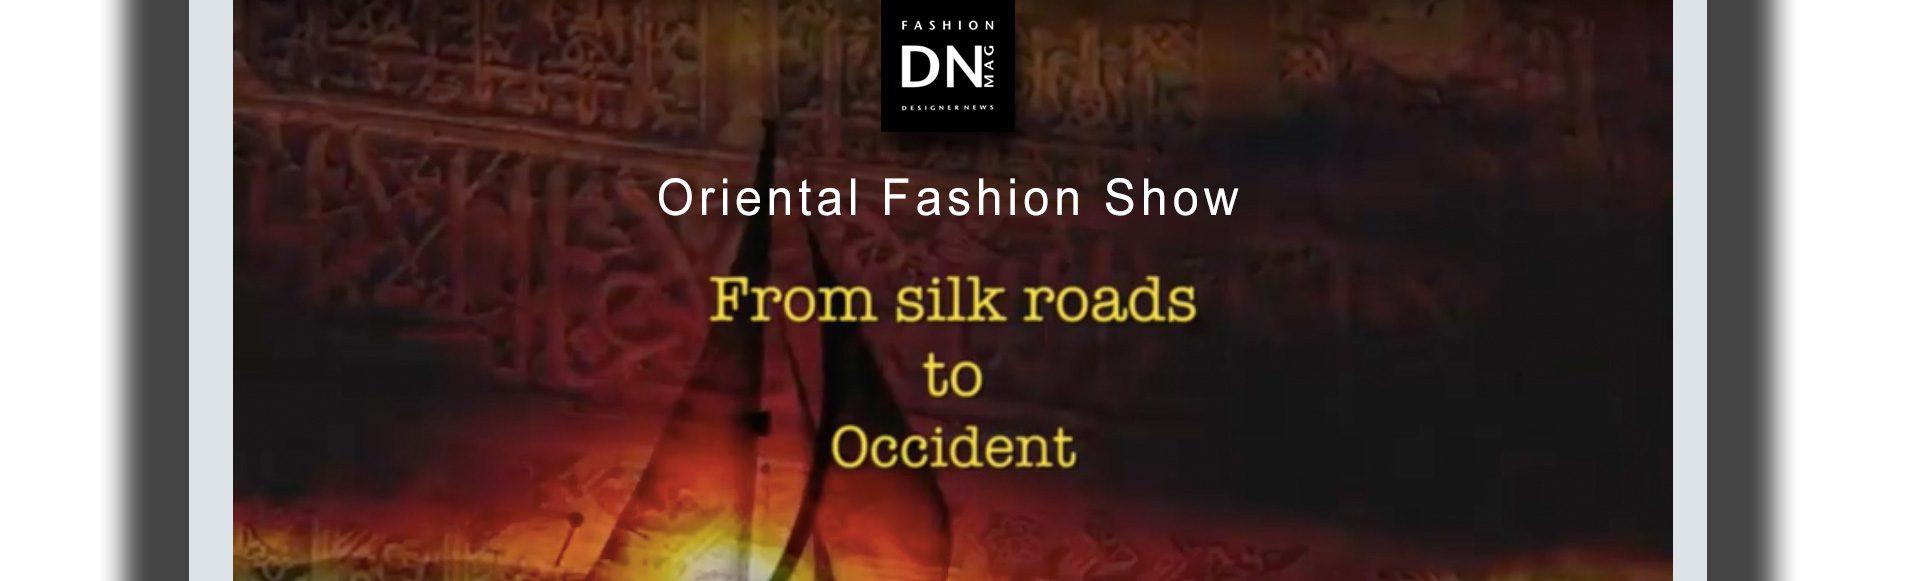 Oriental-Fashion-Show-2018-DNMAG